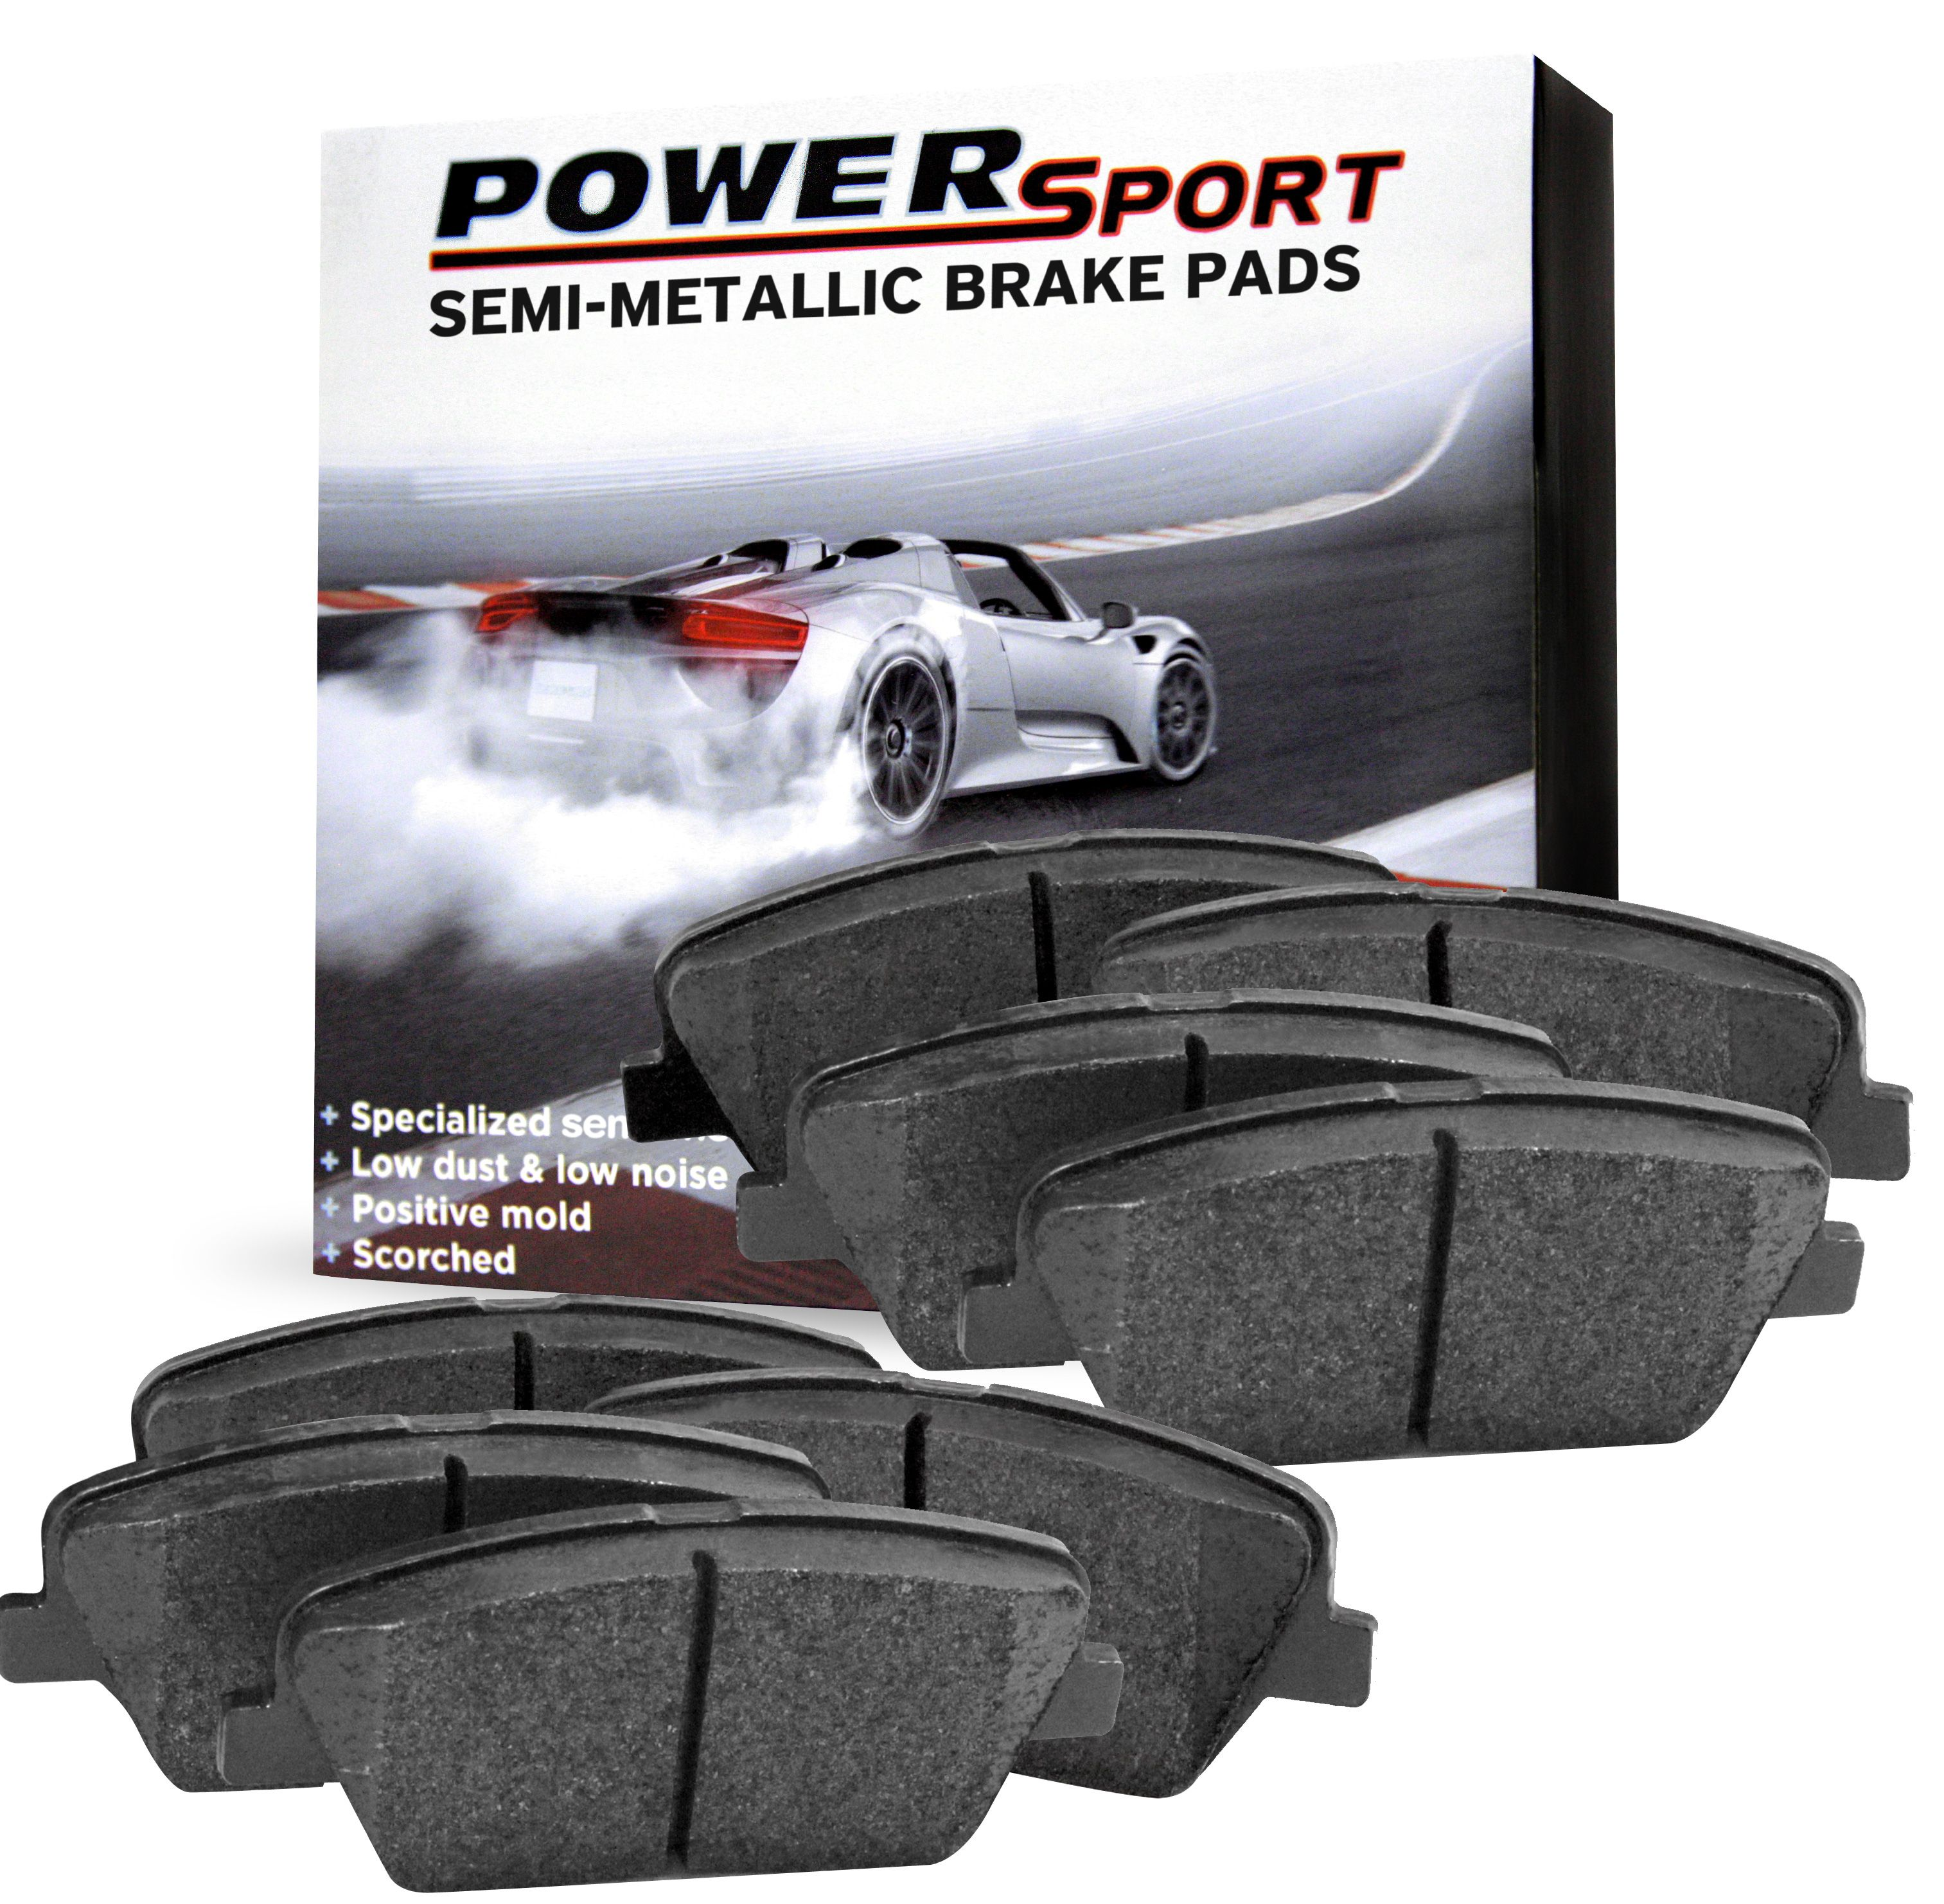 For 12-2011 Lexus GS300 IS250 Front Rear Semi-Metallic Brake Pads